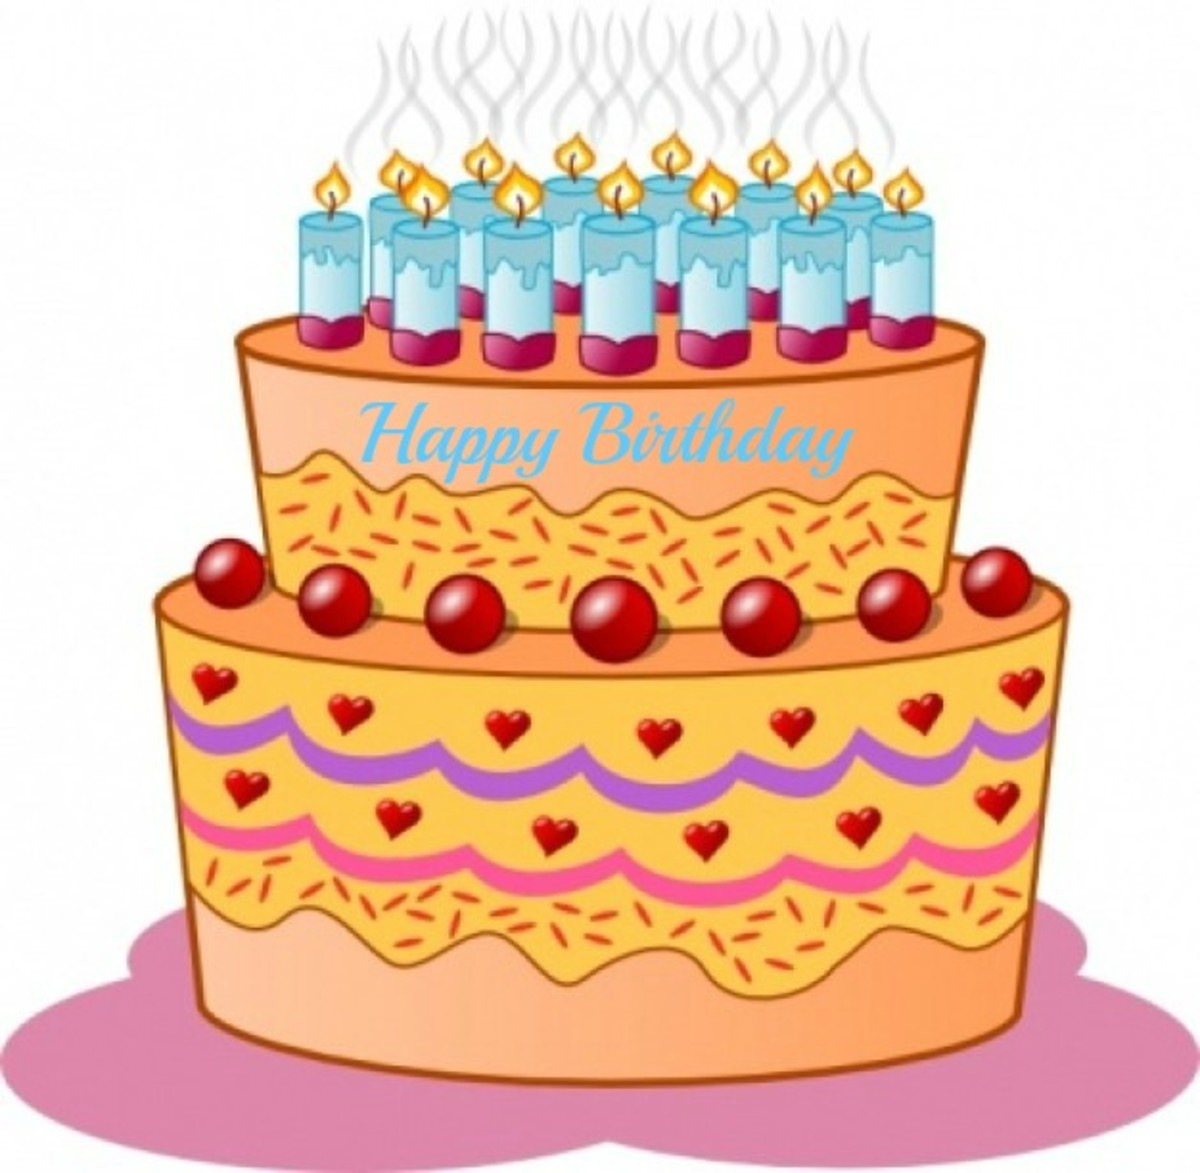 Orange Birthday Cake with Blue Candles